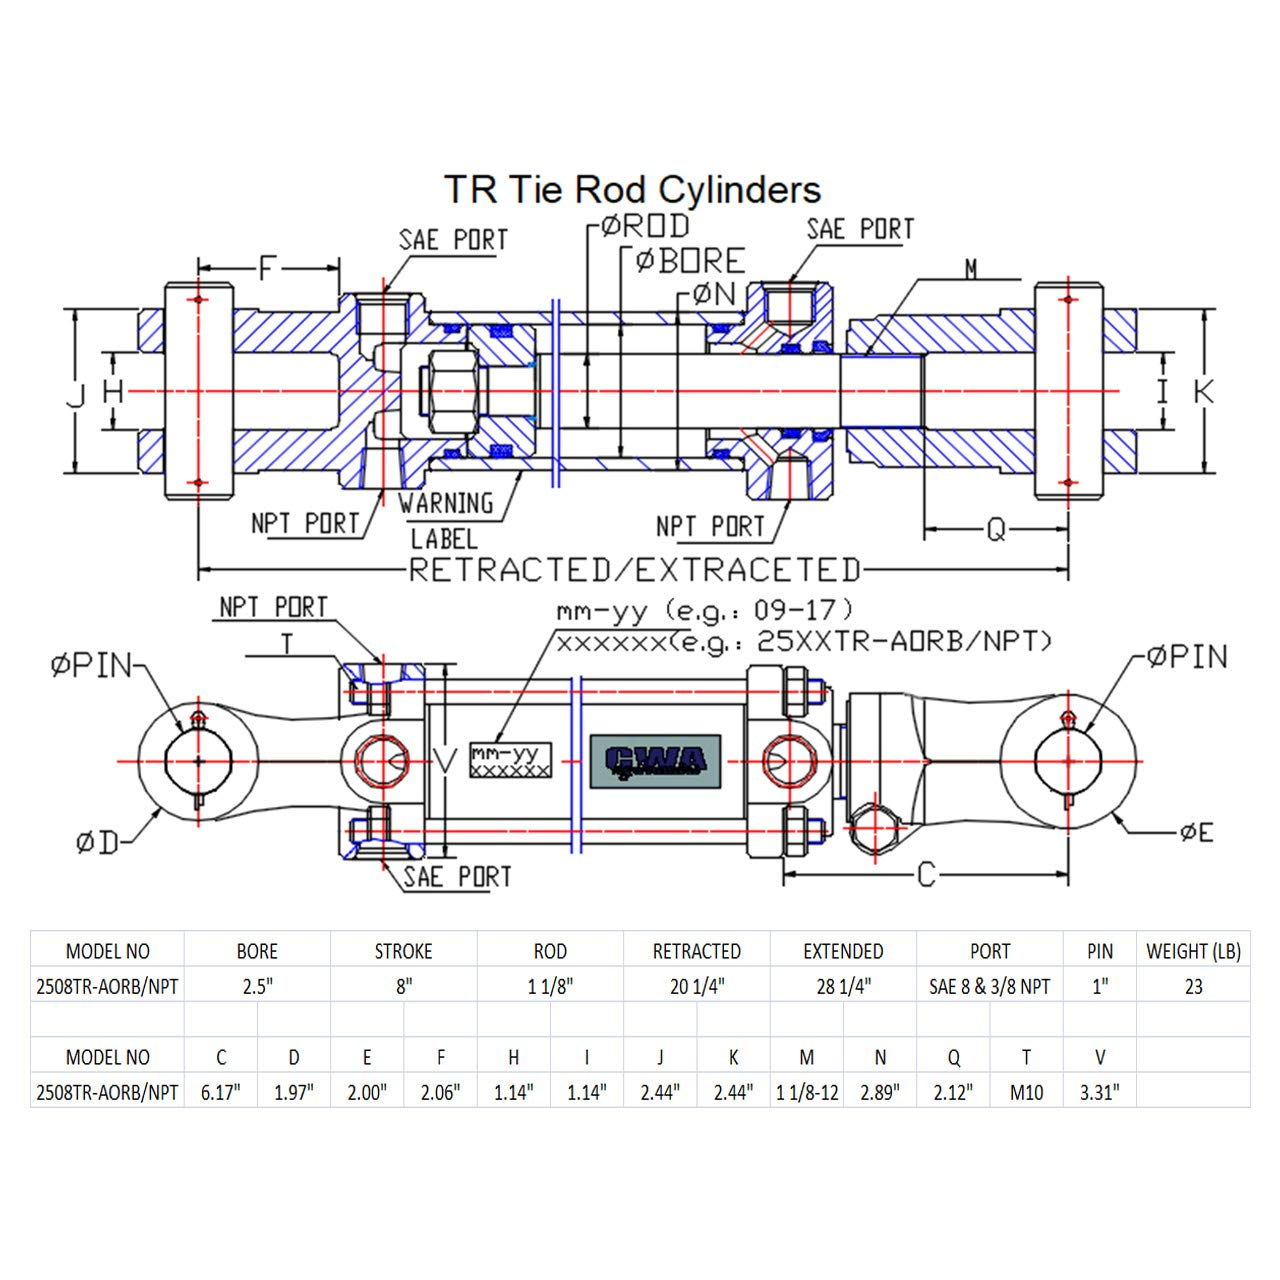 SAE 8 and 1//2 NPT Port CWA Hydraulics TR Tie Rod Hydraulic Cylinder 3 1//2 Bore x 18 Stroke x 1 1//4 Rod x 2500 PSI